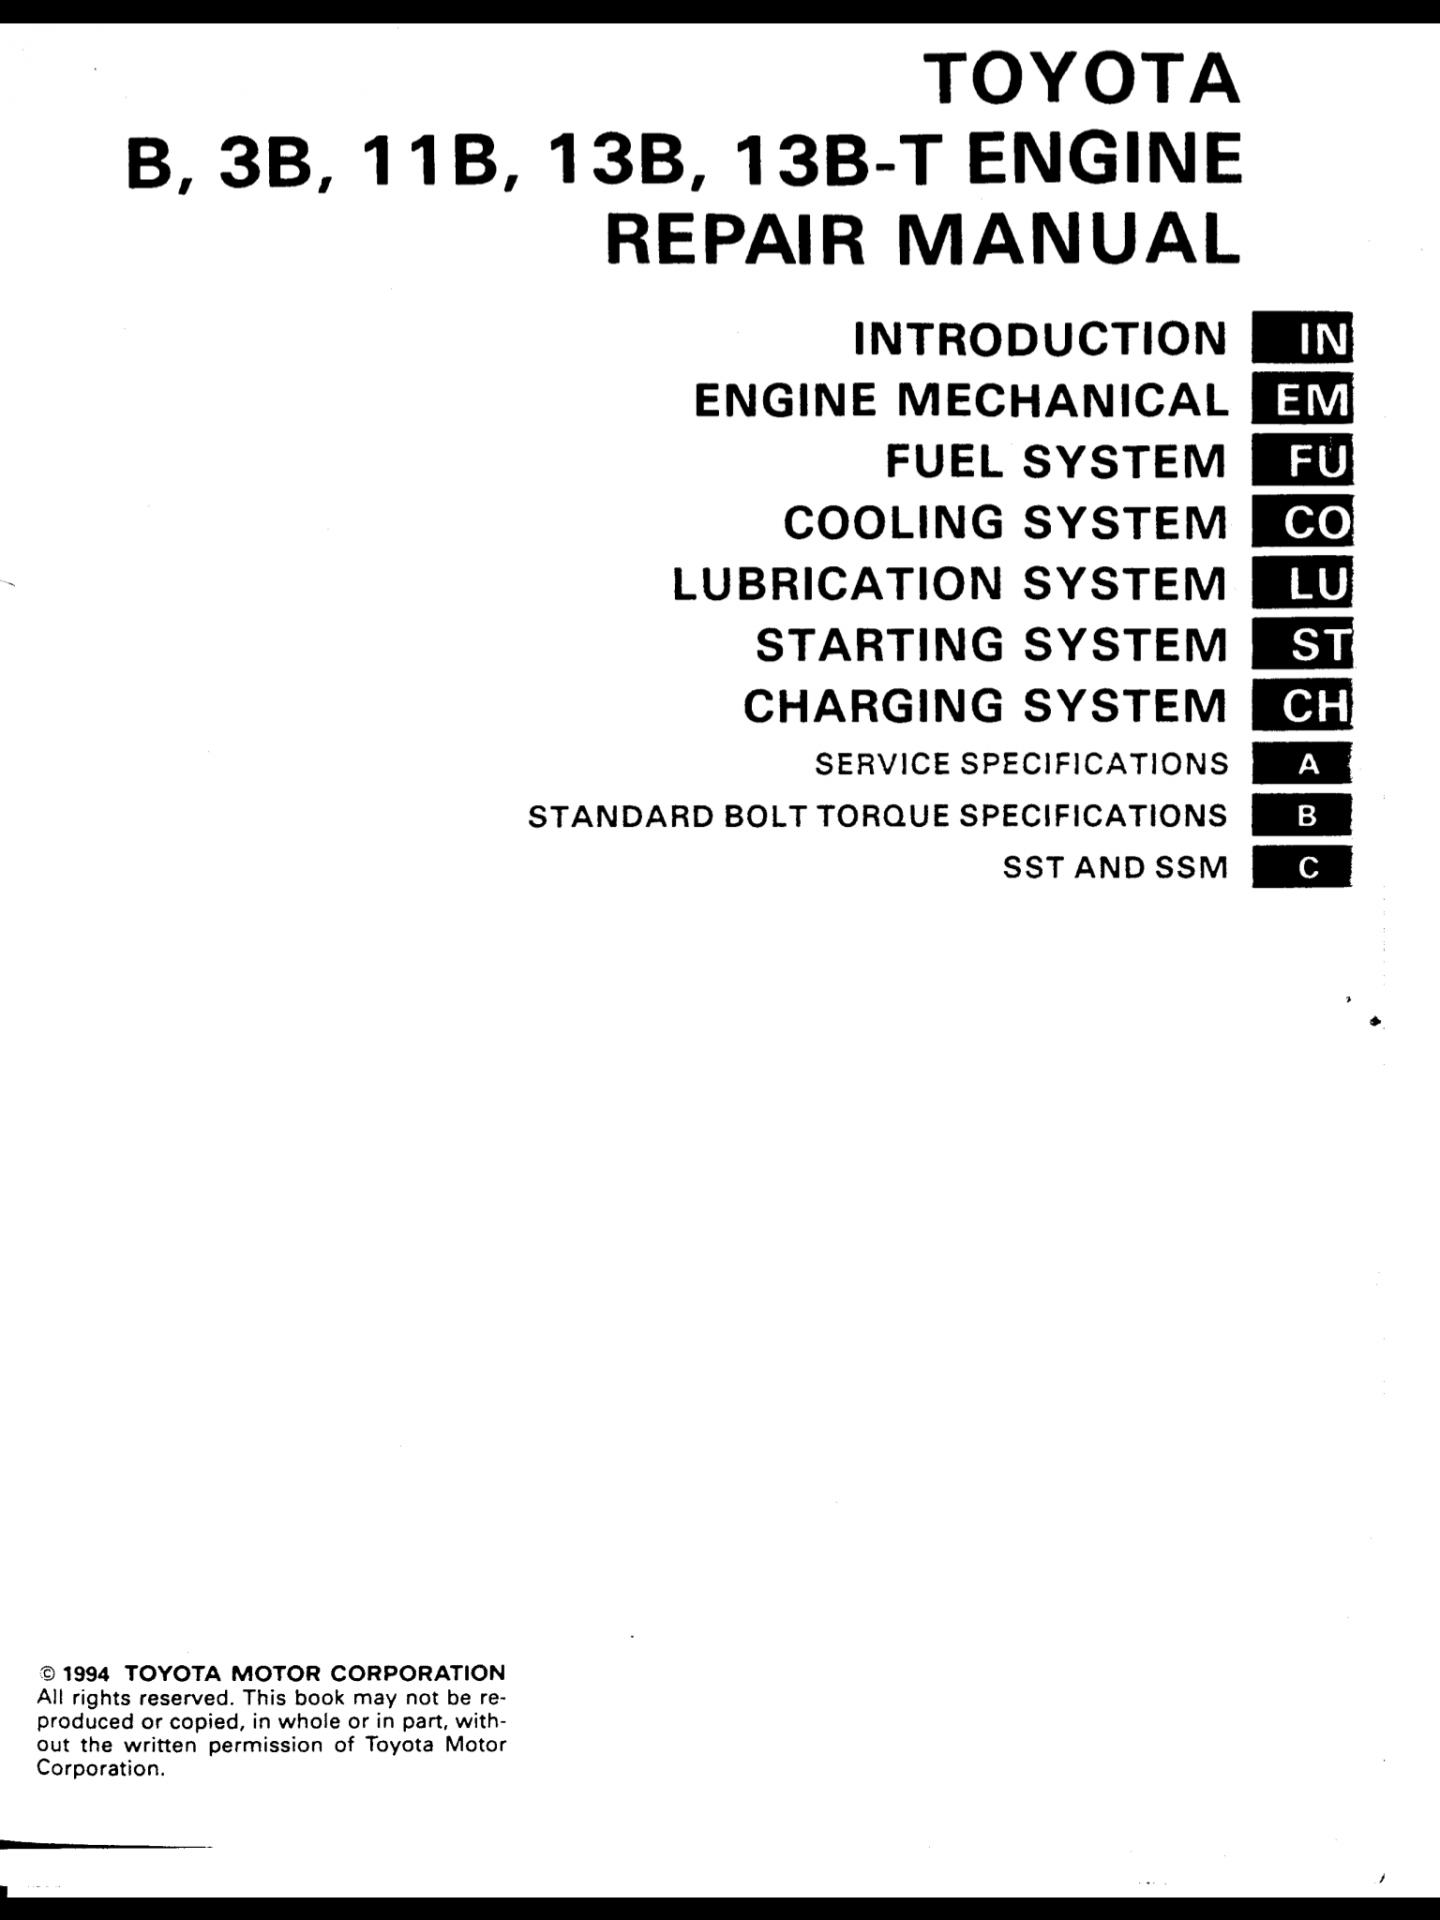 CA2F0E85-3AD1-4216-AEAA-589B7DAB5BCD.png